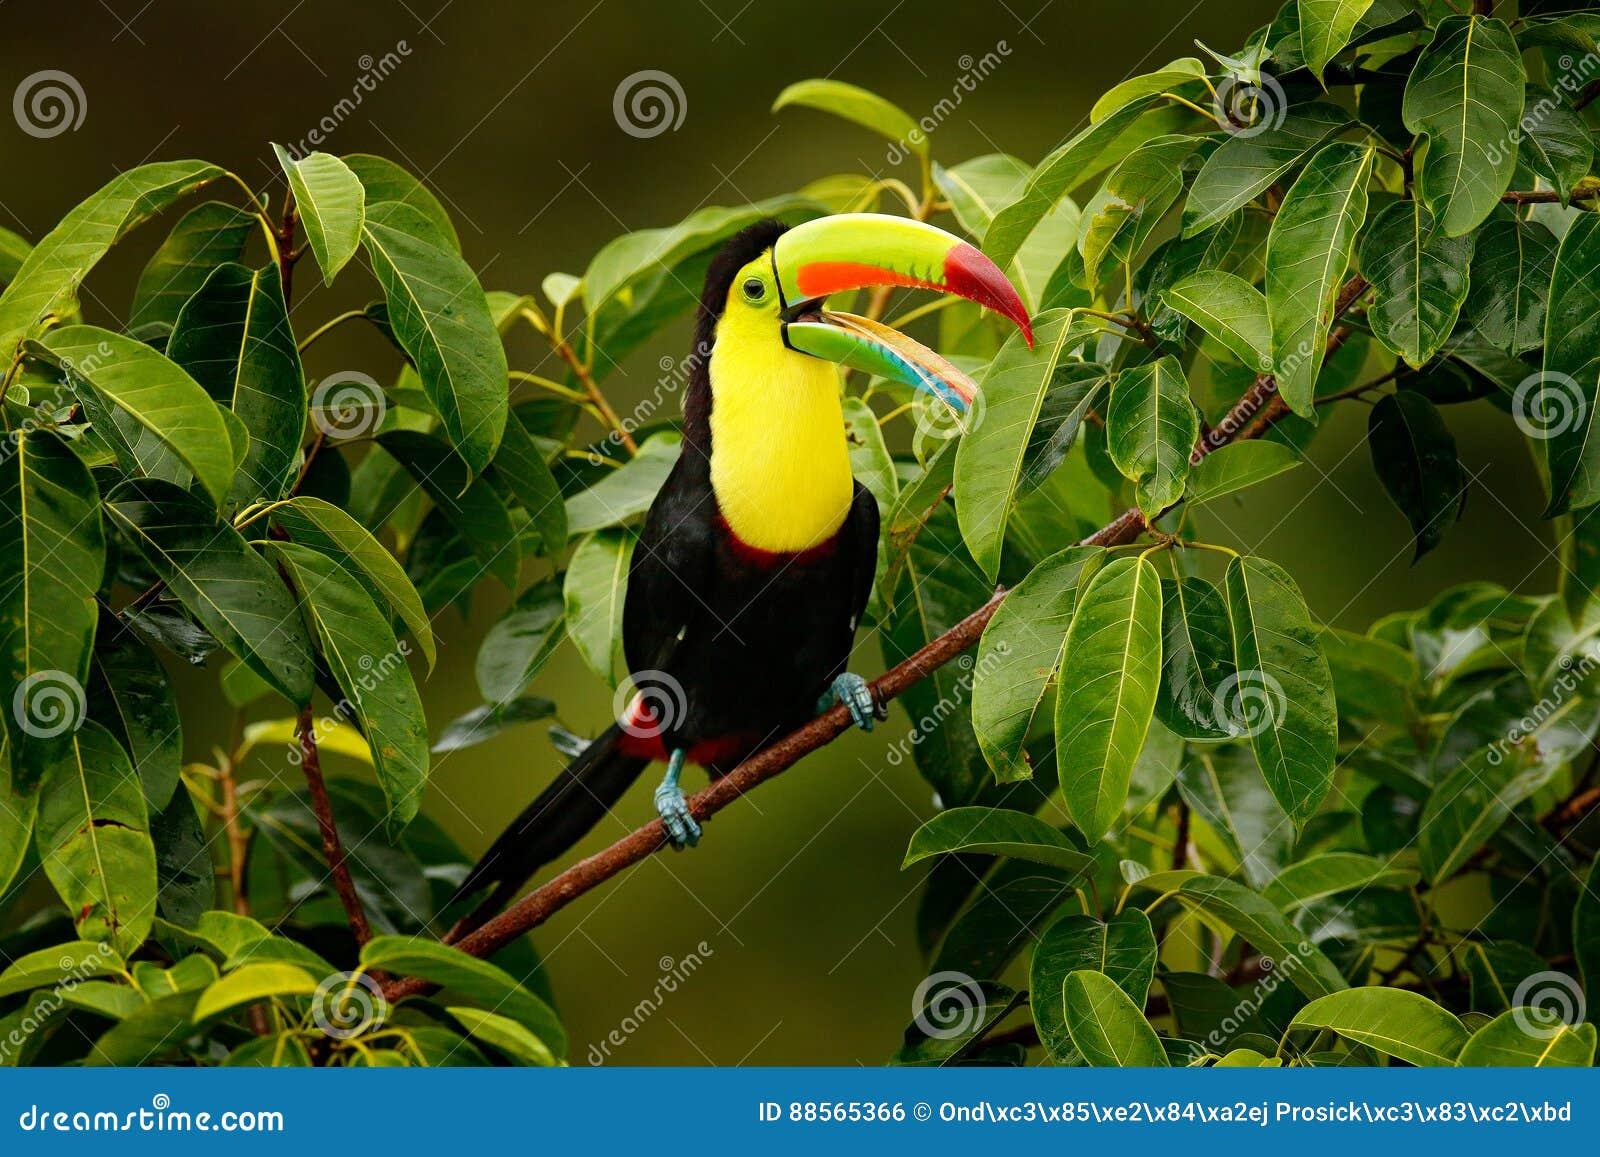 Toekanzitting op de tak in het bos, Boca Tapada, groene vegetatie, Costa Rica Aardreis in Midden-Amerika Kiel-rekening